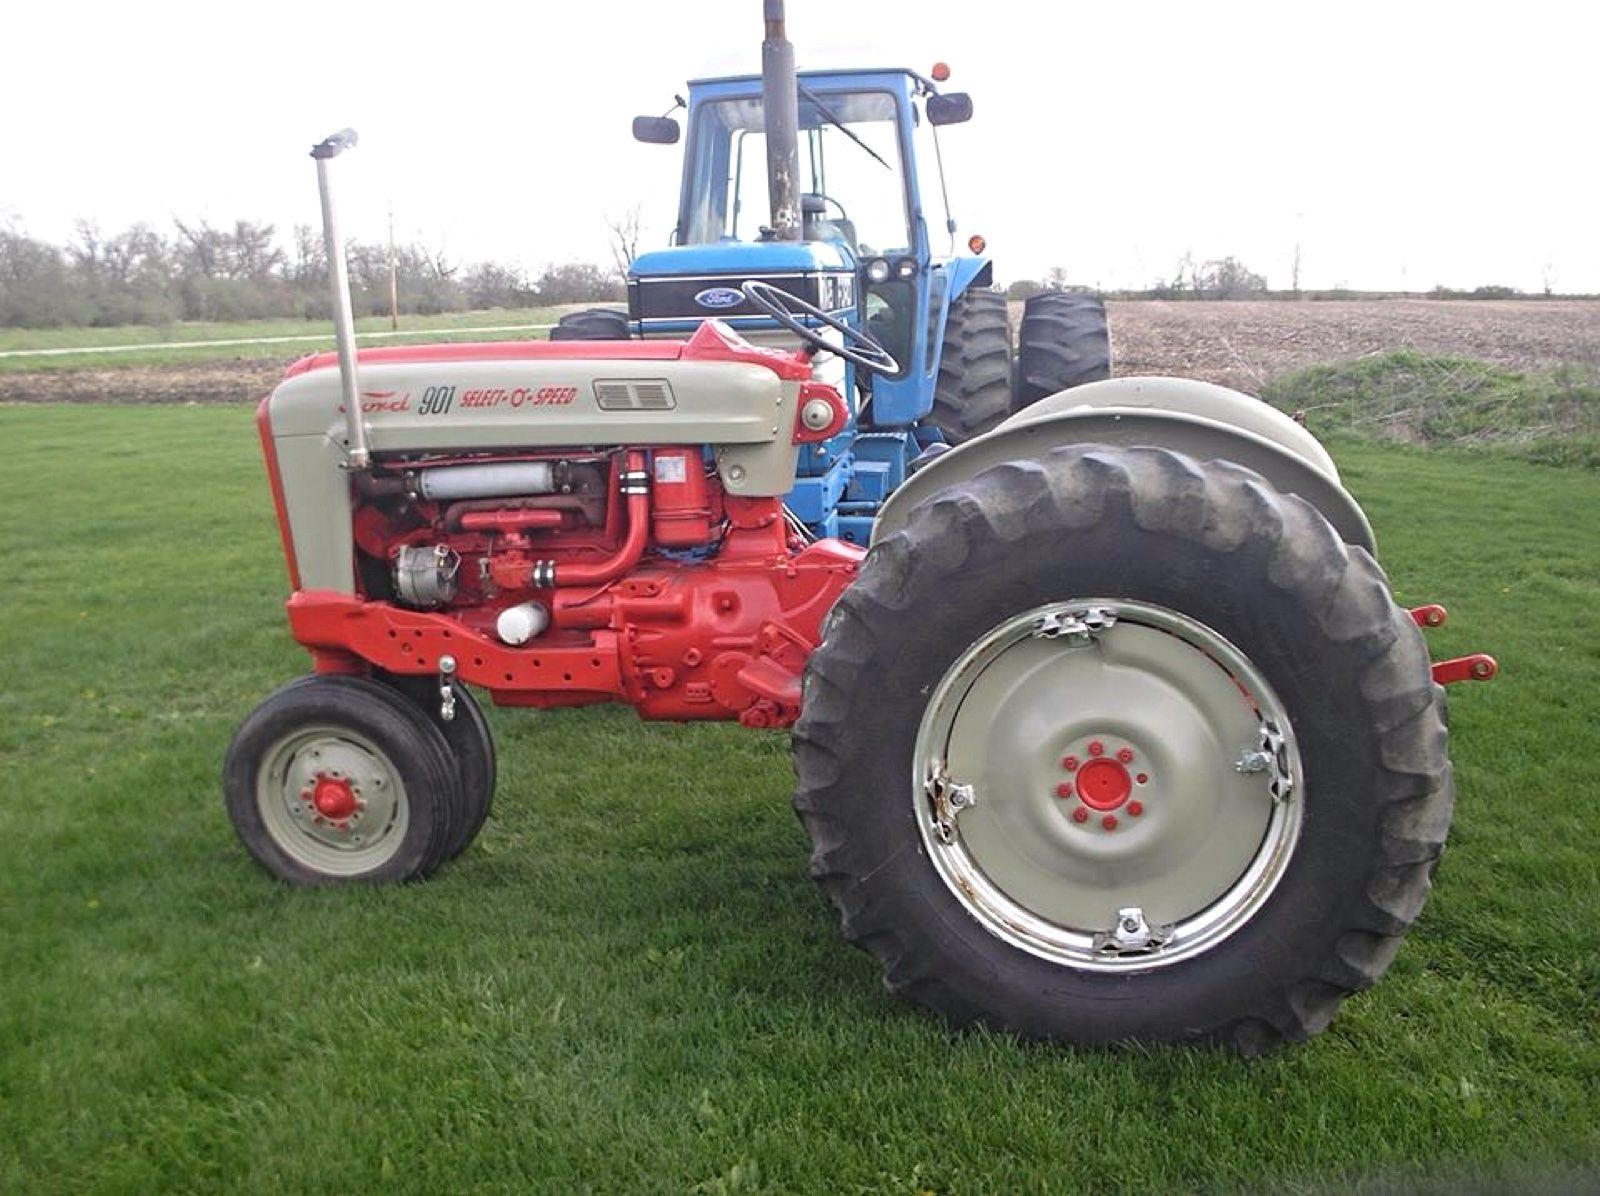 1964 Ford 2000 Tractor 4000 Parts Diagram Car Darren Obvod1 Public Circuit Online Simulator Docircuits 901 Select O Speed Traktor Pinterest Tractors Rh Com